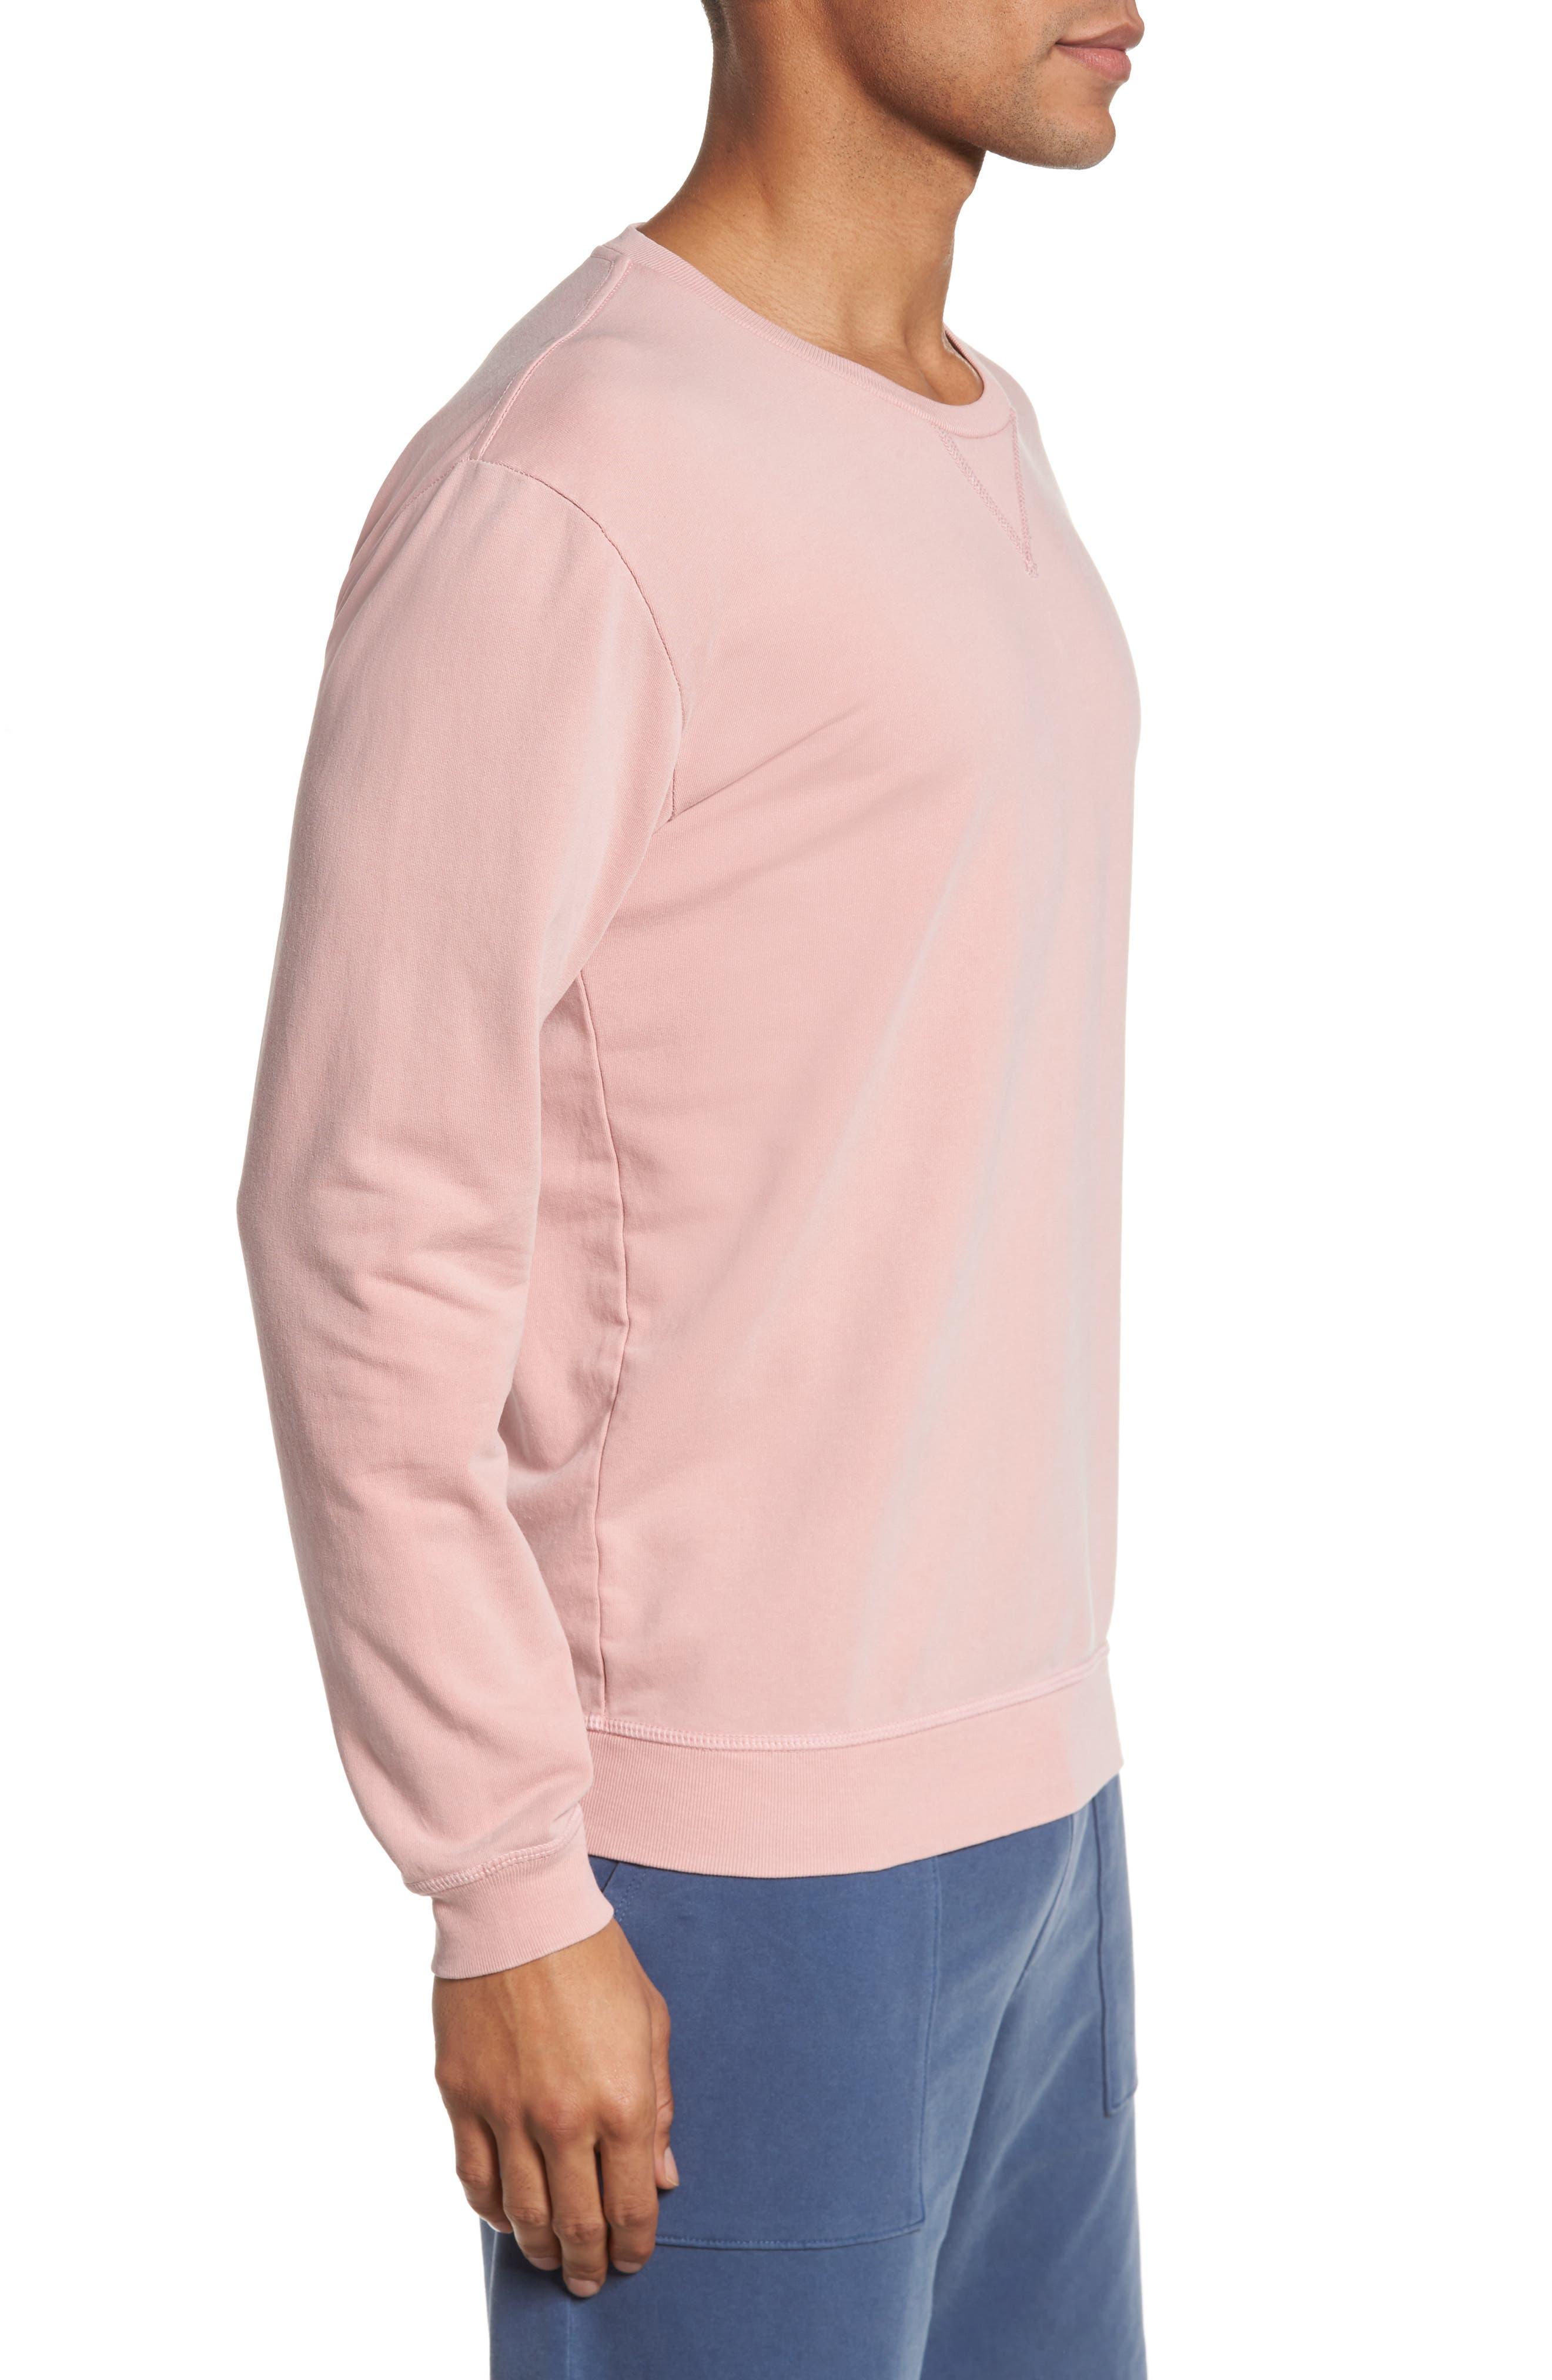 Alternate Image 3  - Goodlife Slim Fit Crewneck Sweatshirt